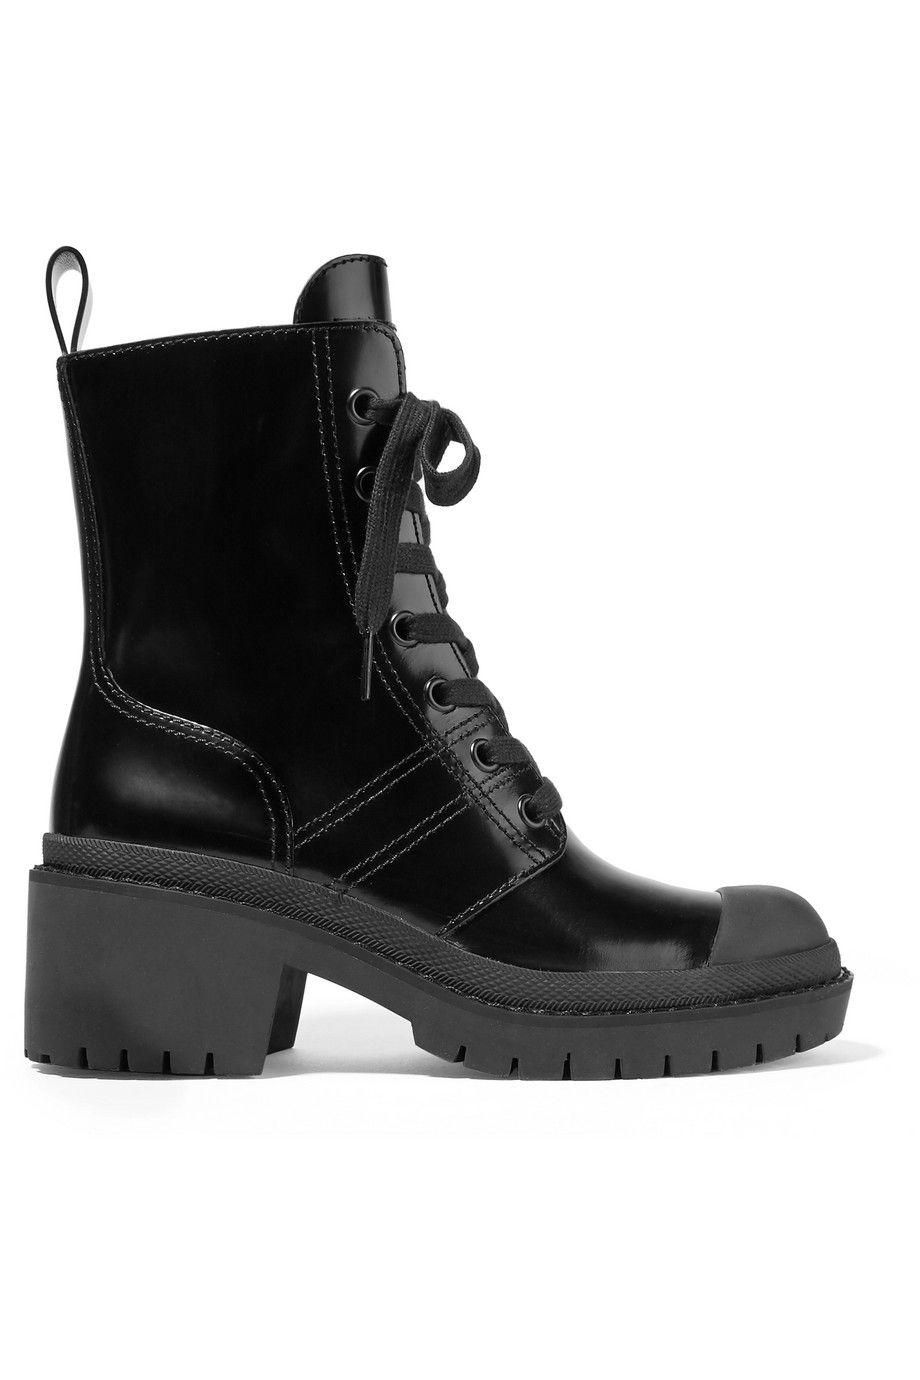 15 Best Combat Boots for Women 2018